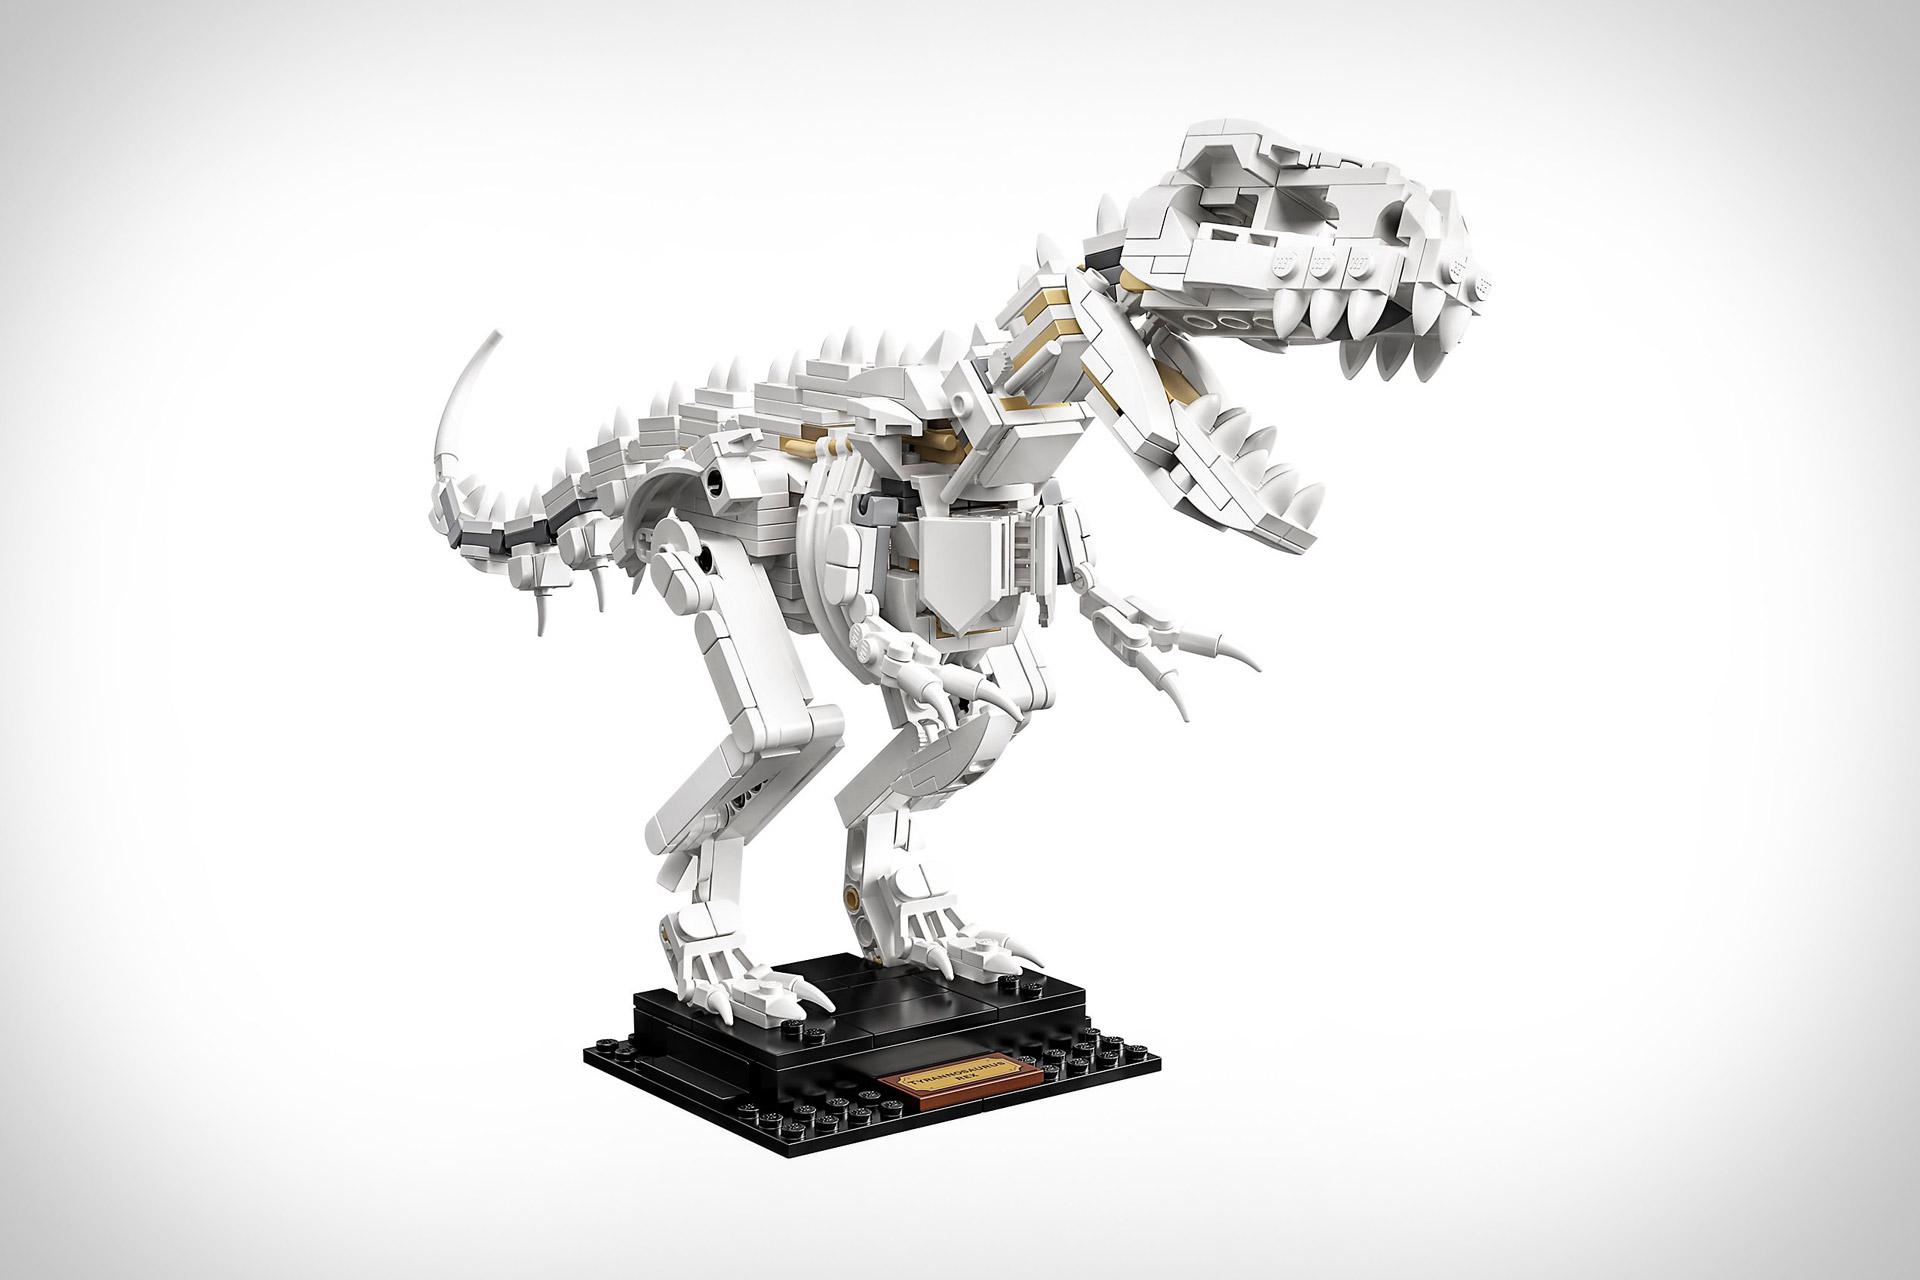 Lego Dinosaur Fossil Building Set